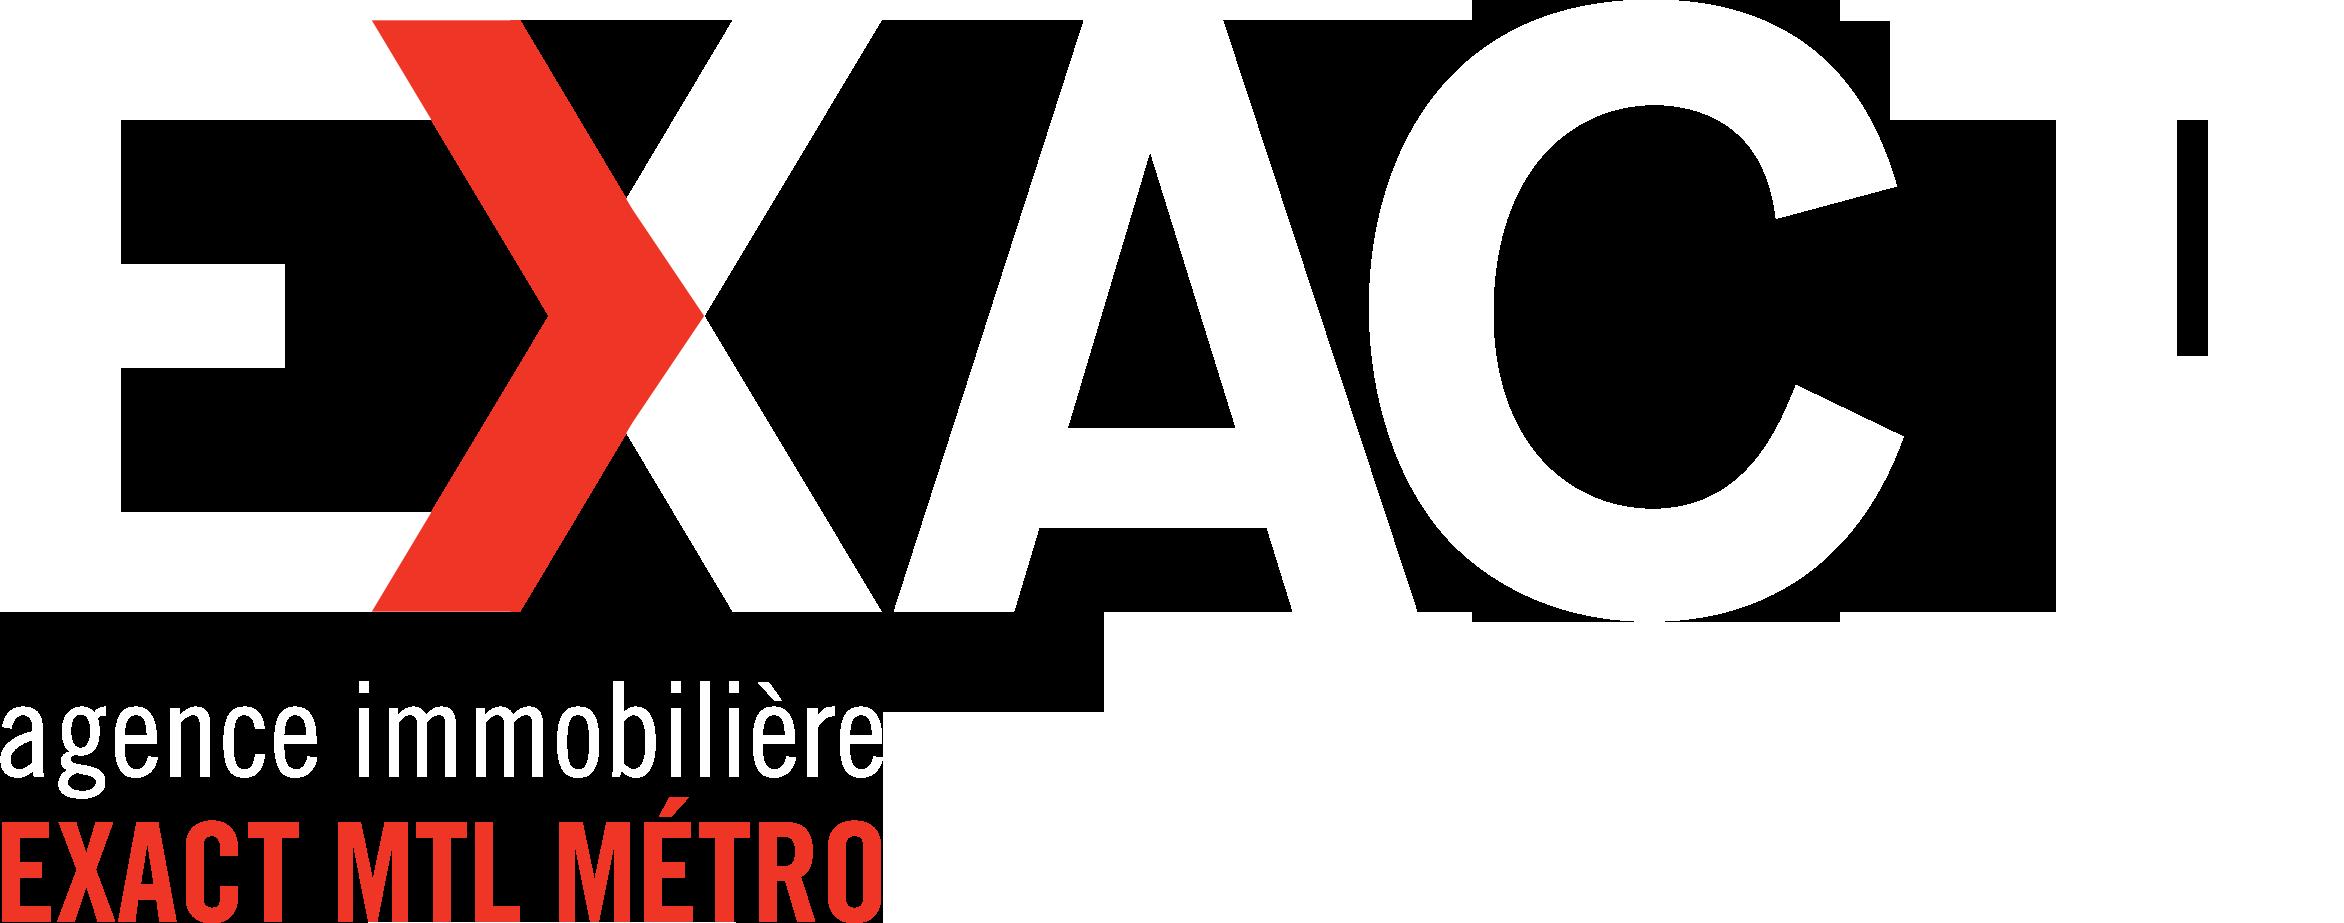 Agence immobilière - EXACT MTL MÉTRO